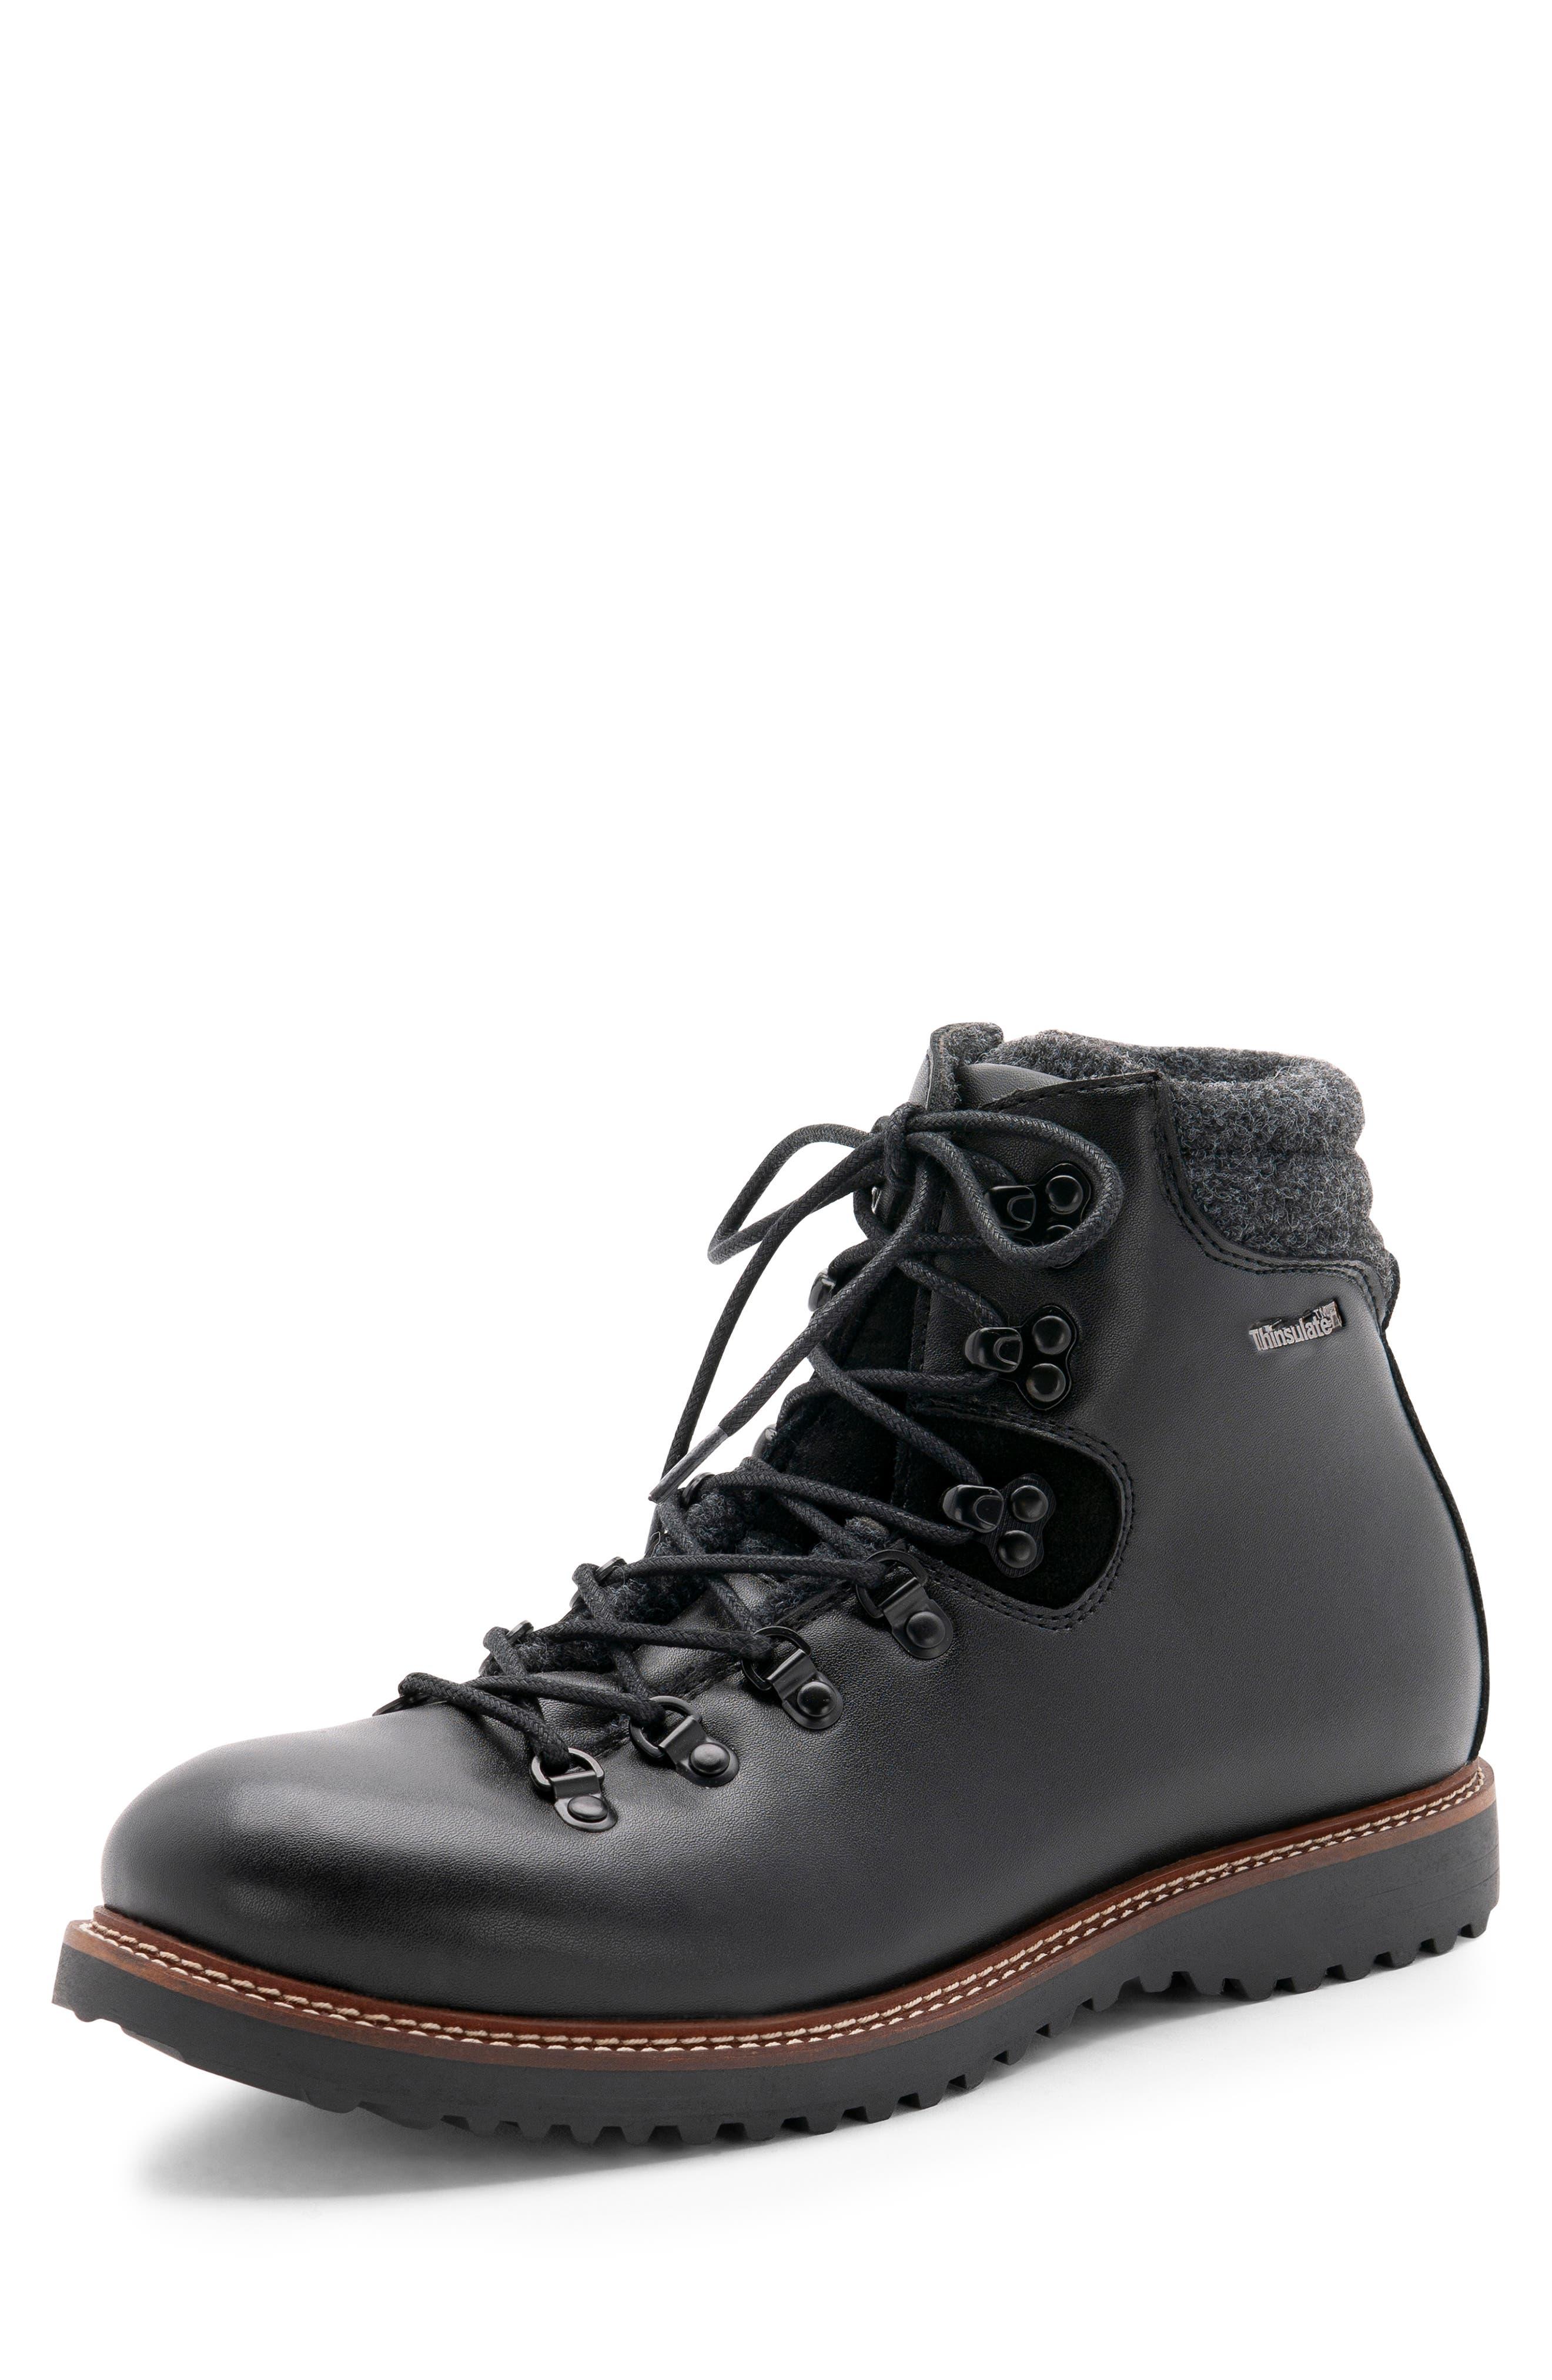 BLONDO, Morgan Waterproof Plain Toe Boot, Alternate thumbnail 8, color, BLACK LEATHER